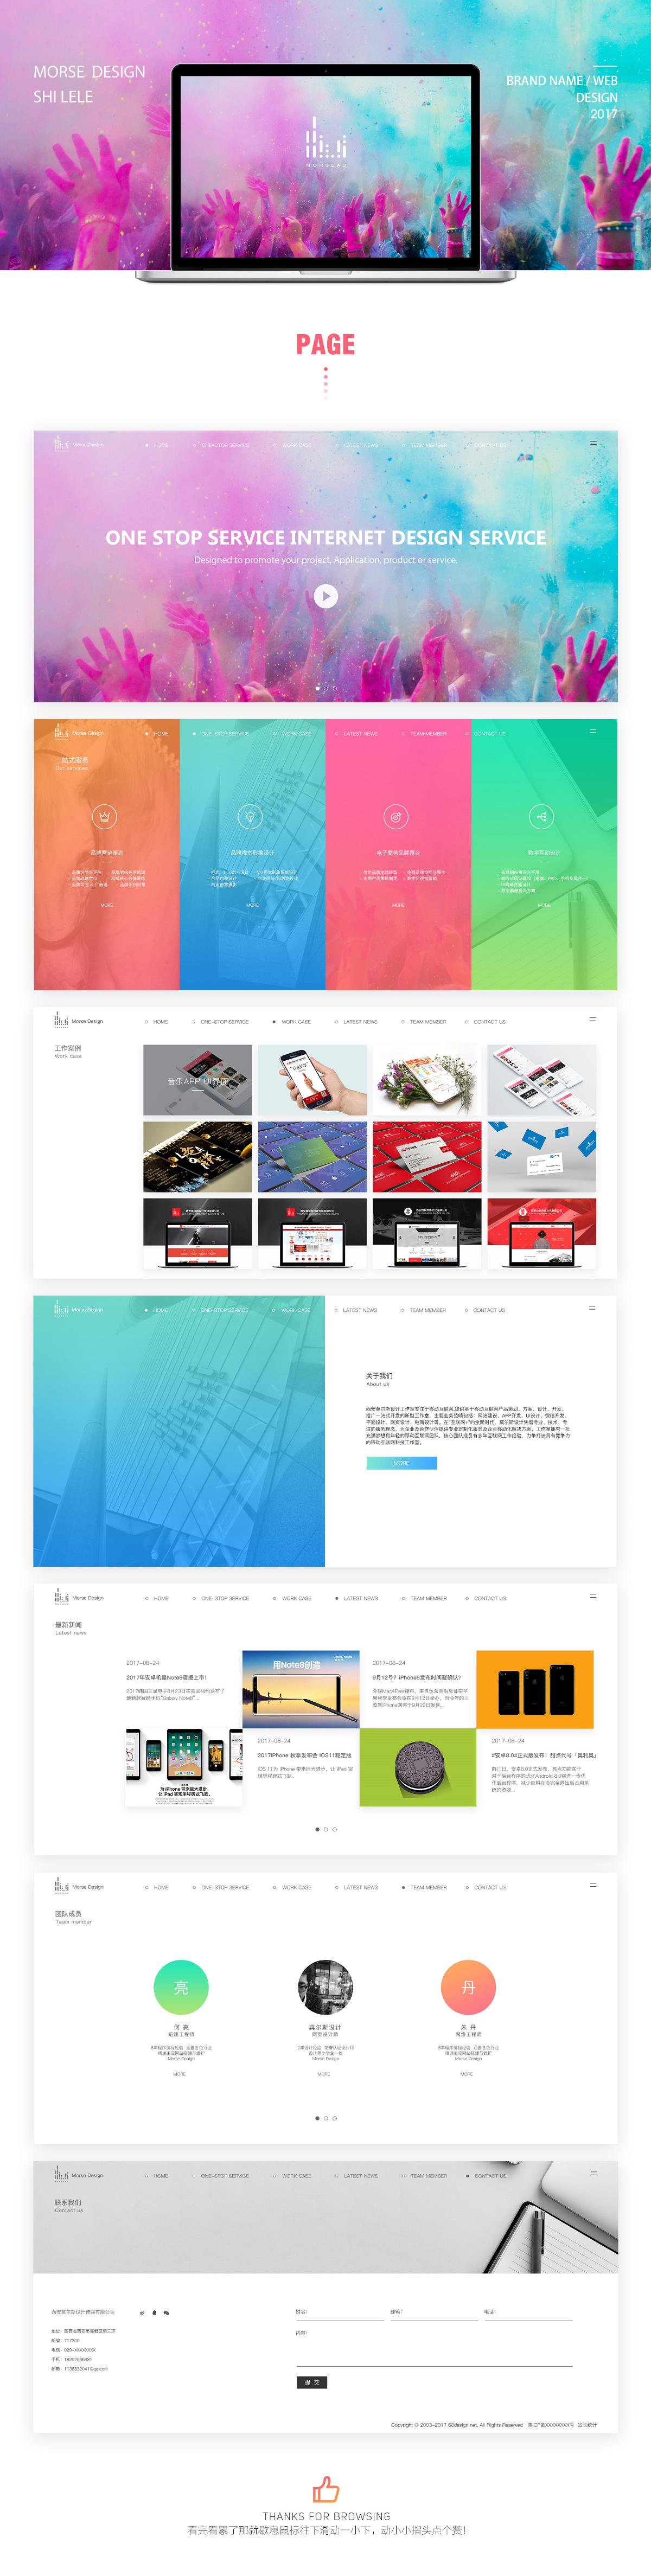 【Morse design】临摹网站/原作uemo团队/非原创